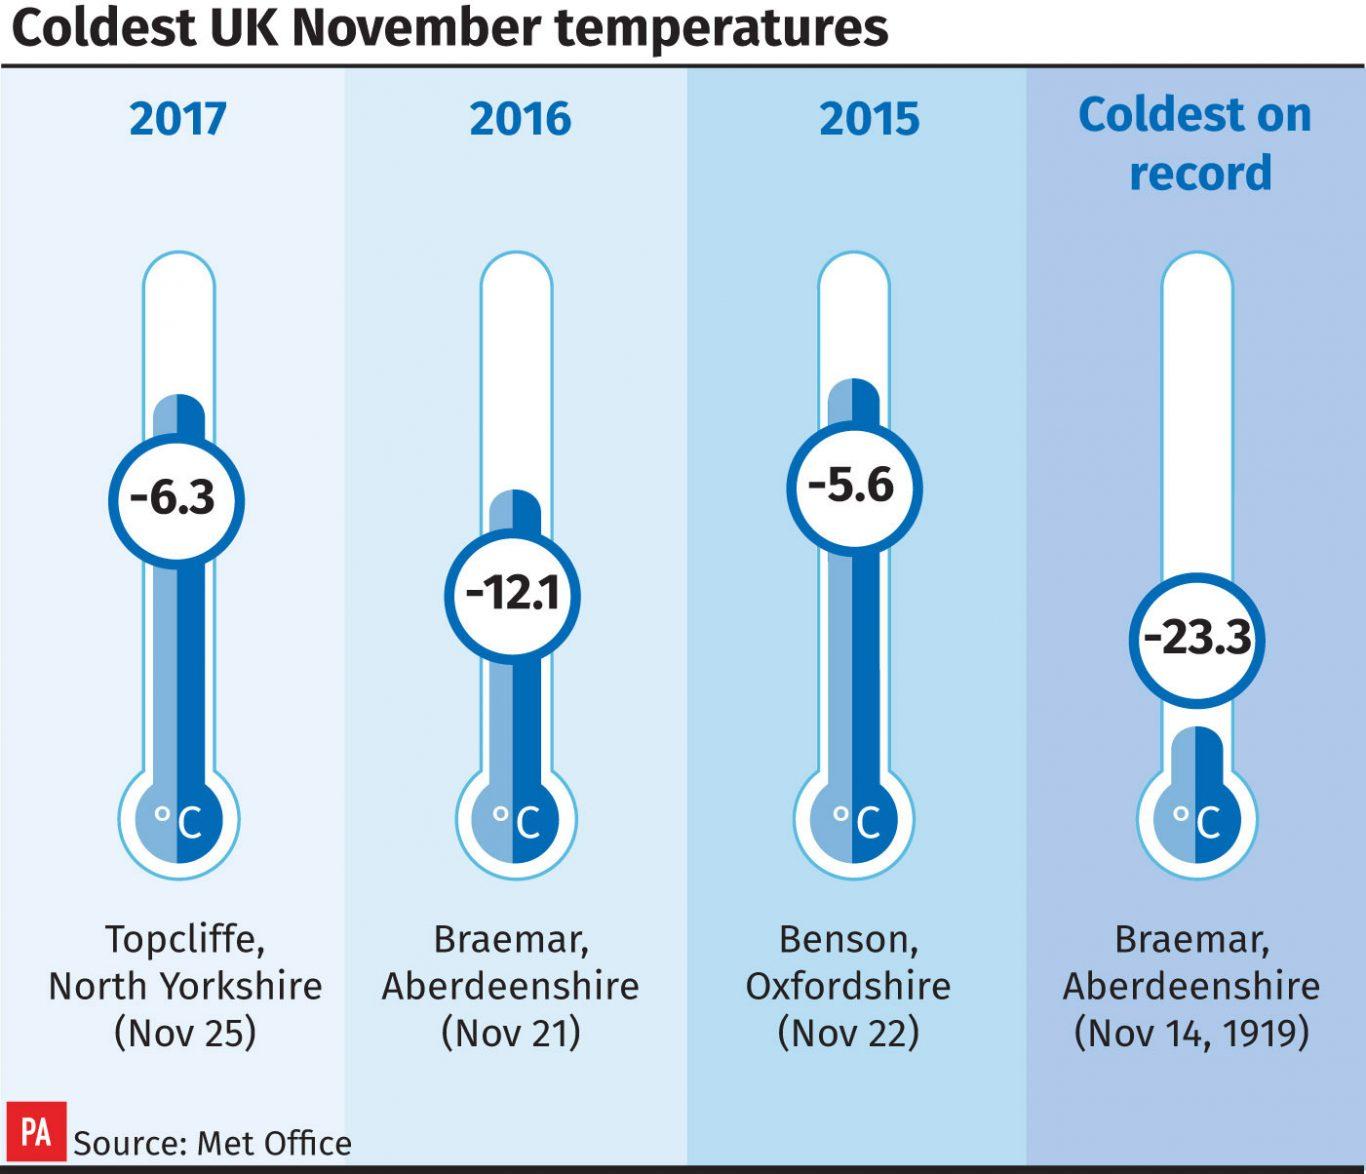 Coldest UK November temperatures